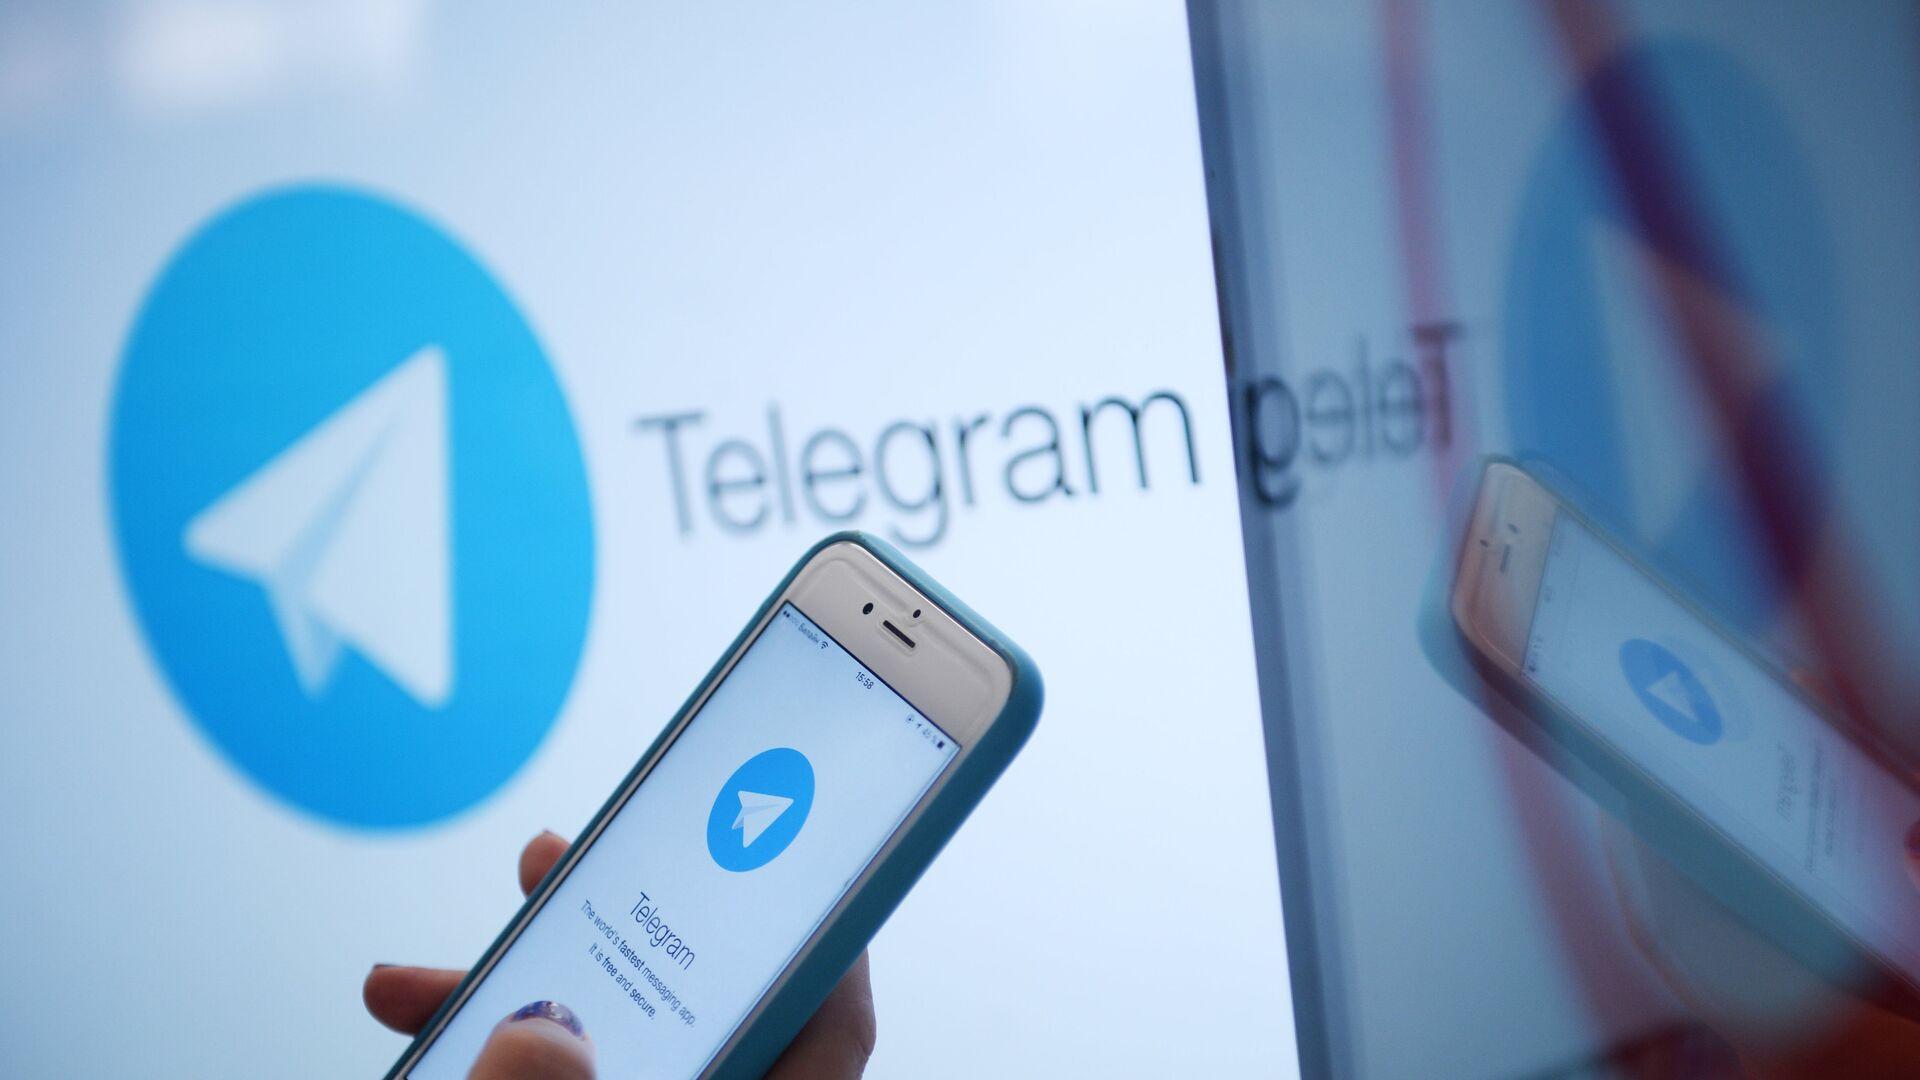 Логотип мессенджера Telegram на экране монитора и телефона - РИА Новости, 1920, 29.01.2021